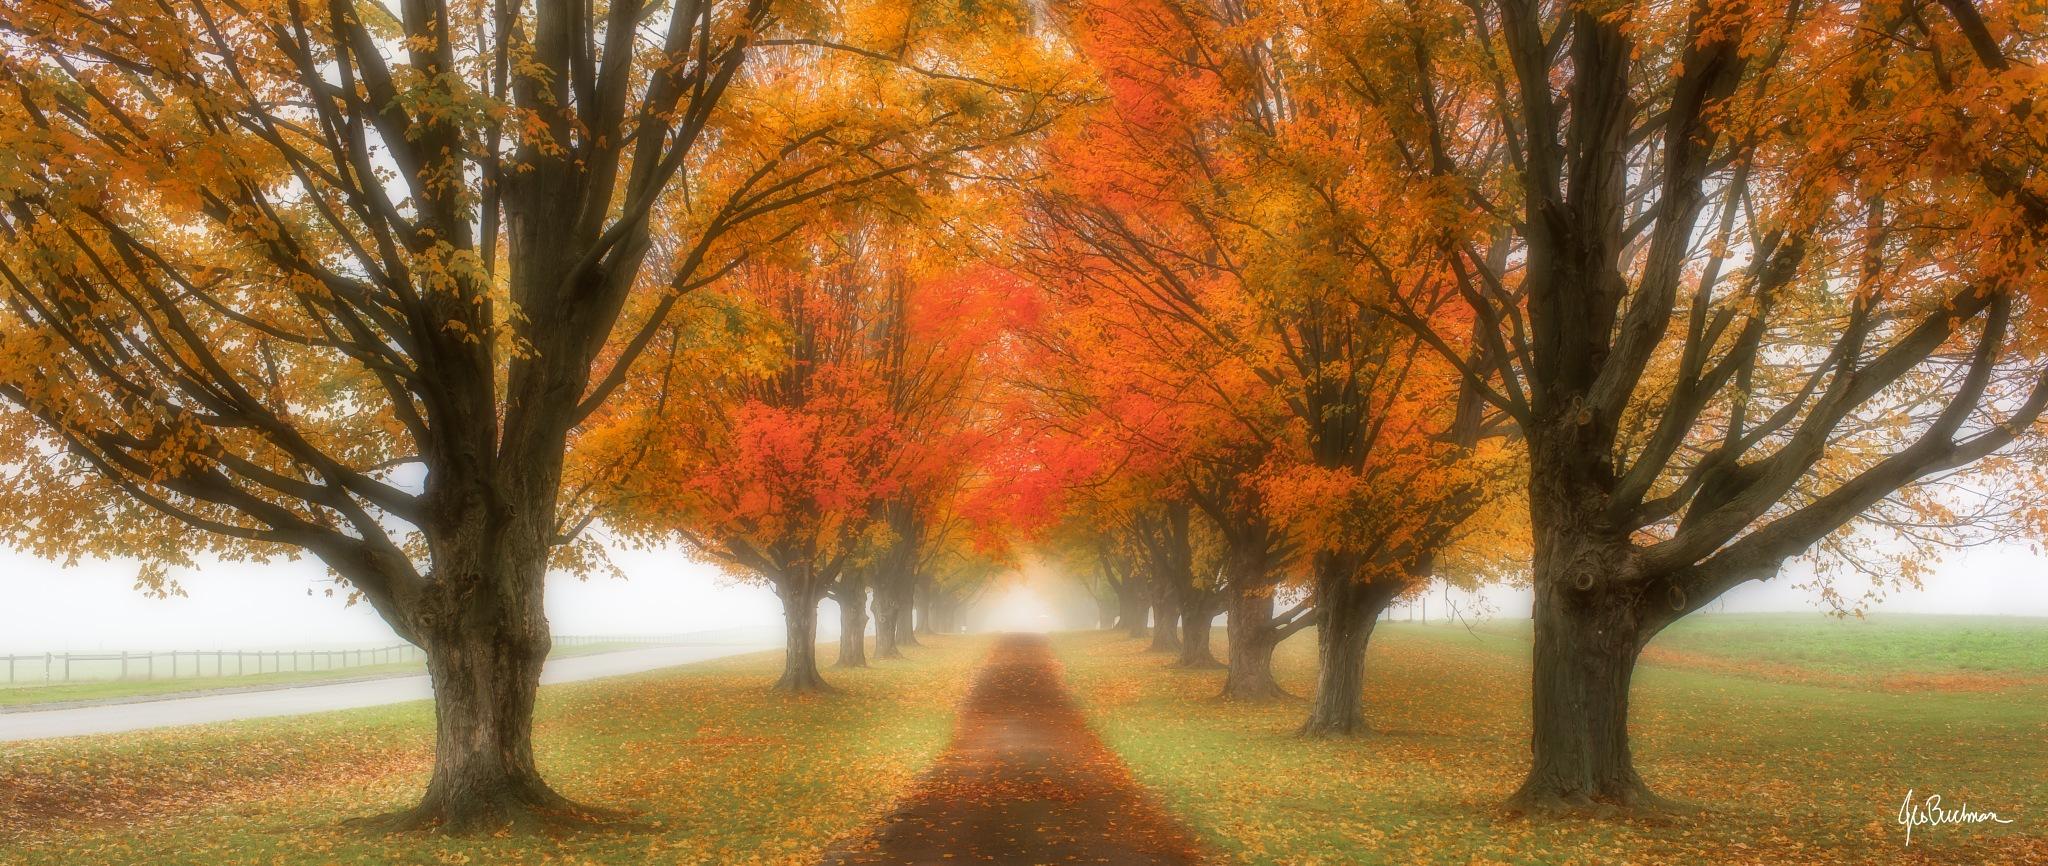 Autumn Road by Jeb Buchman